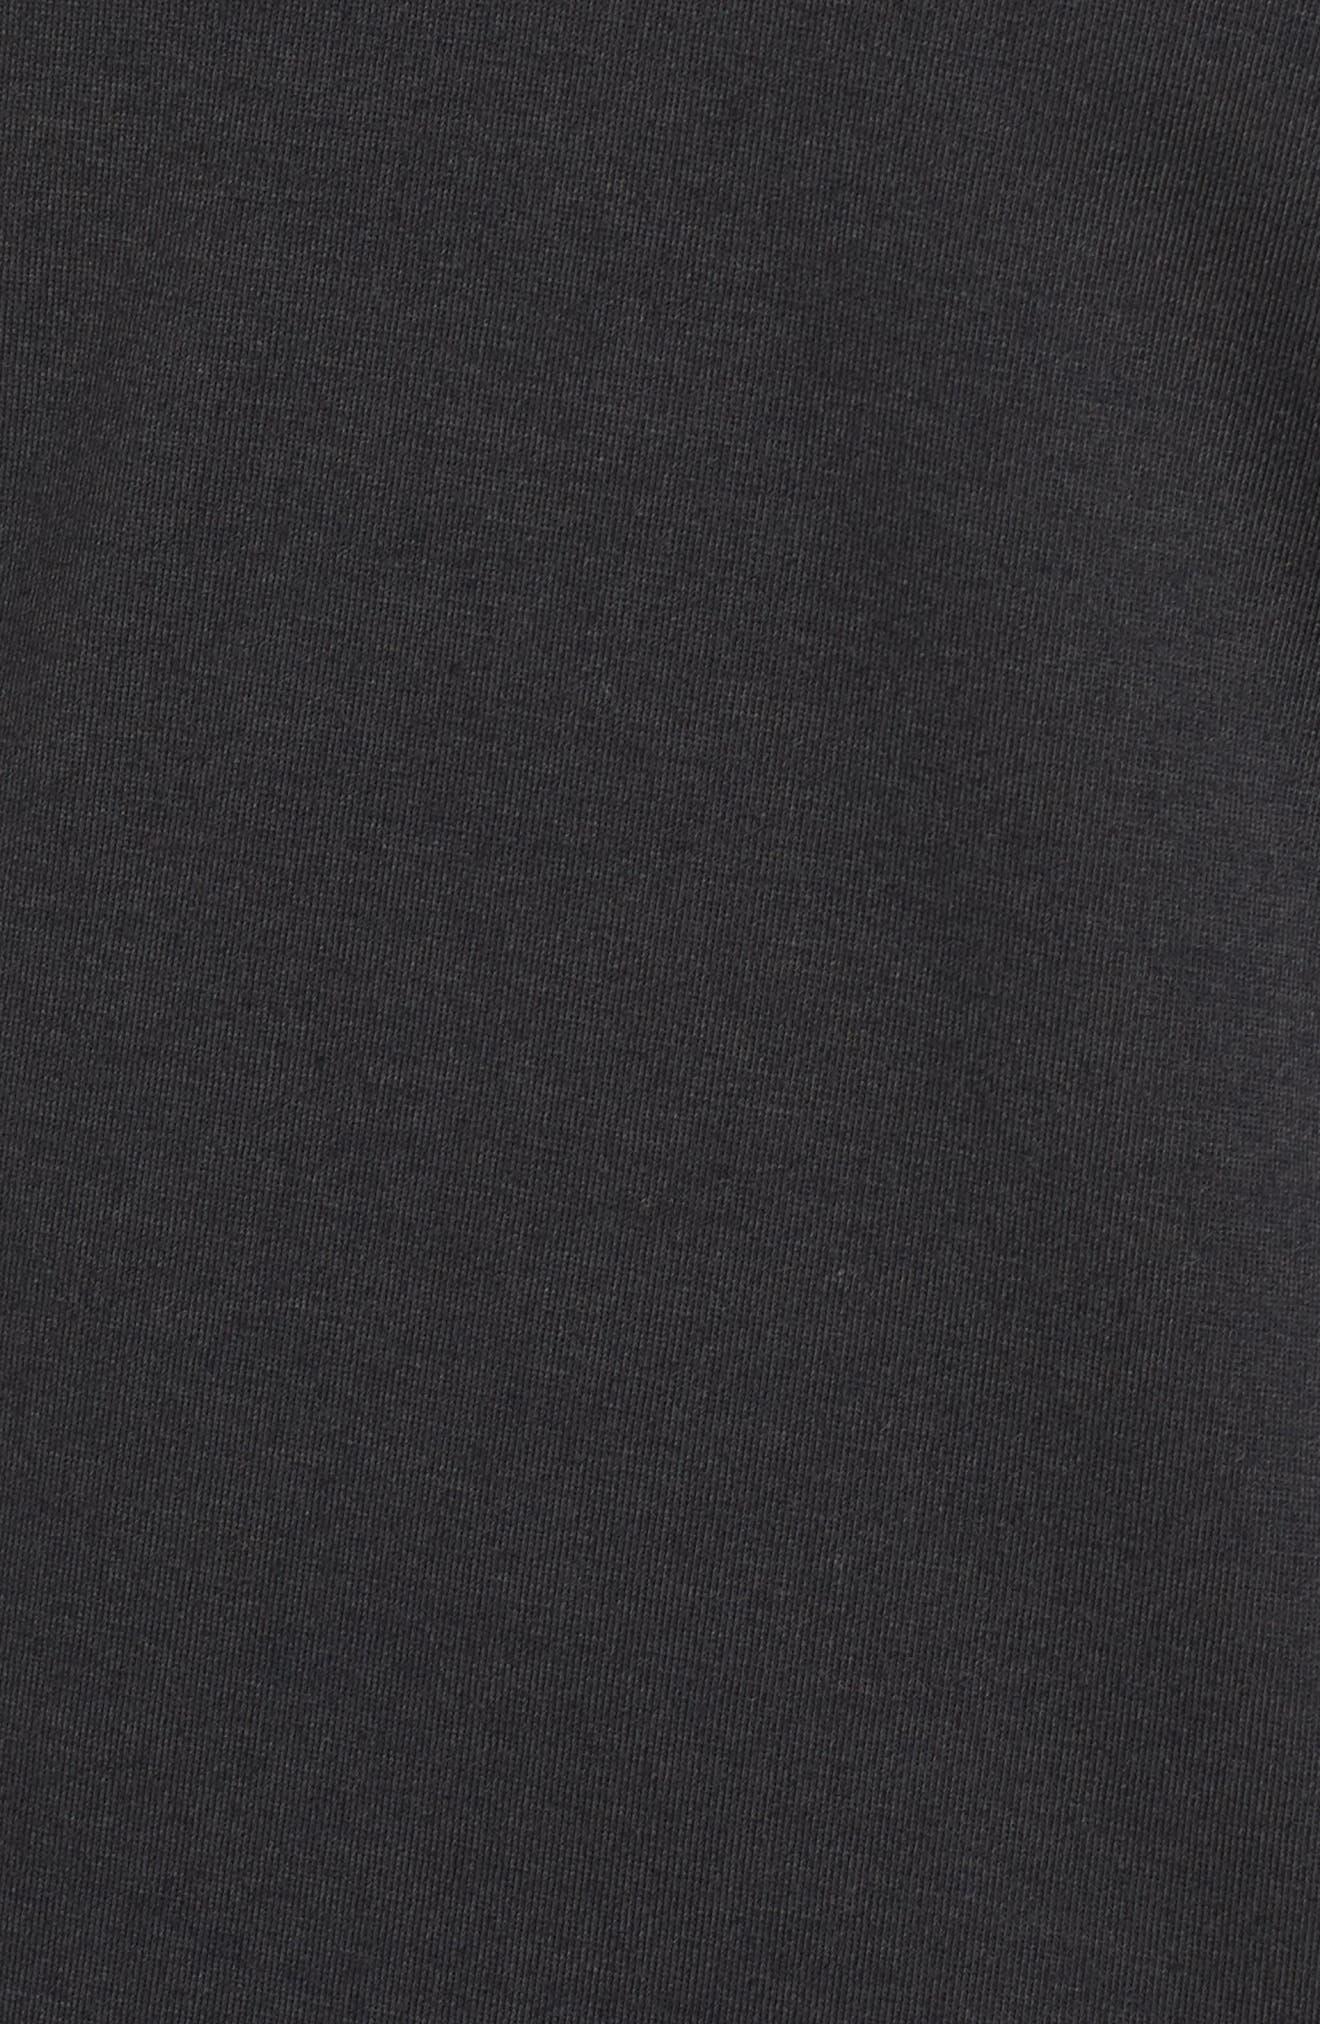 Swyft Funnel Neck Hoodie,                             Alternate thumbnail 6, color,                             BLACK/ BLACK/ REFLECTIVE